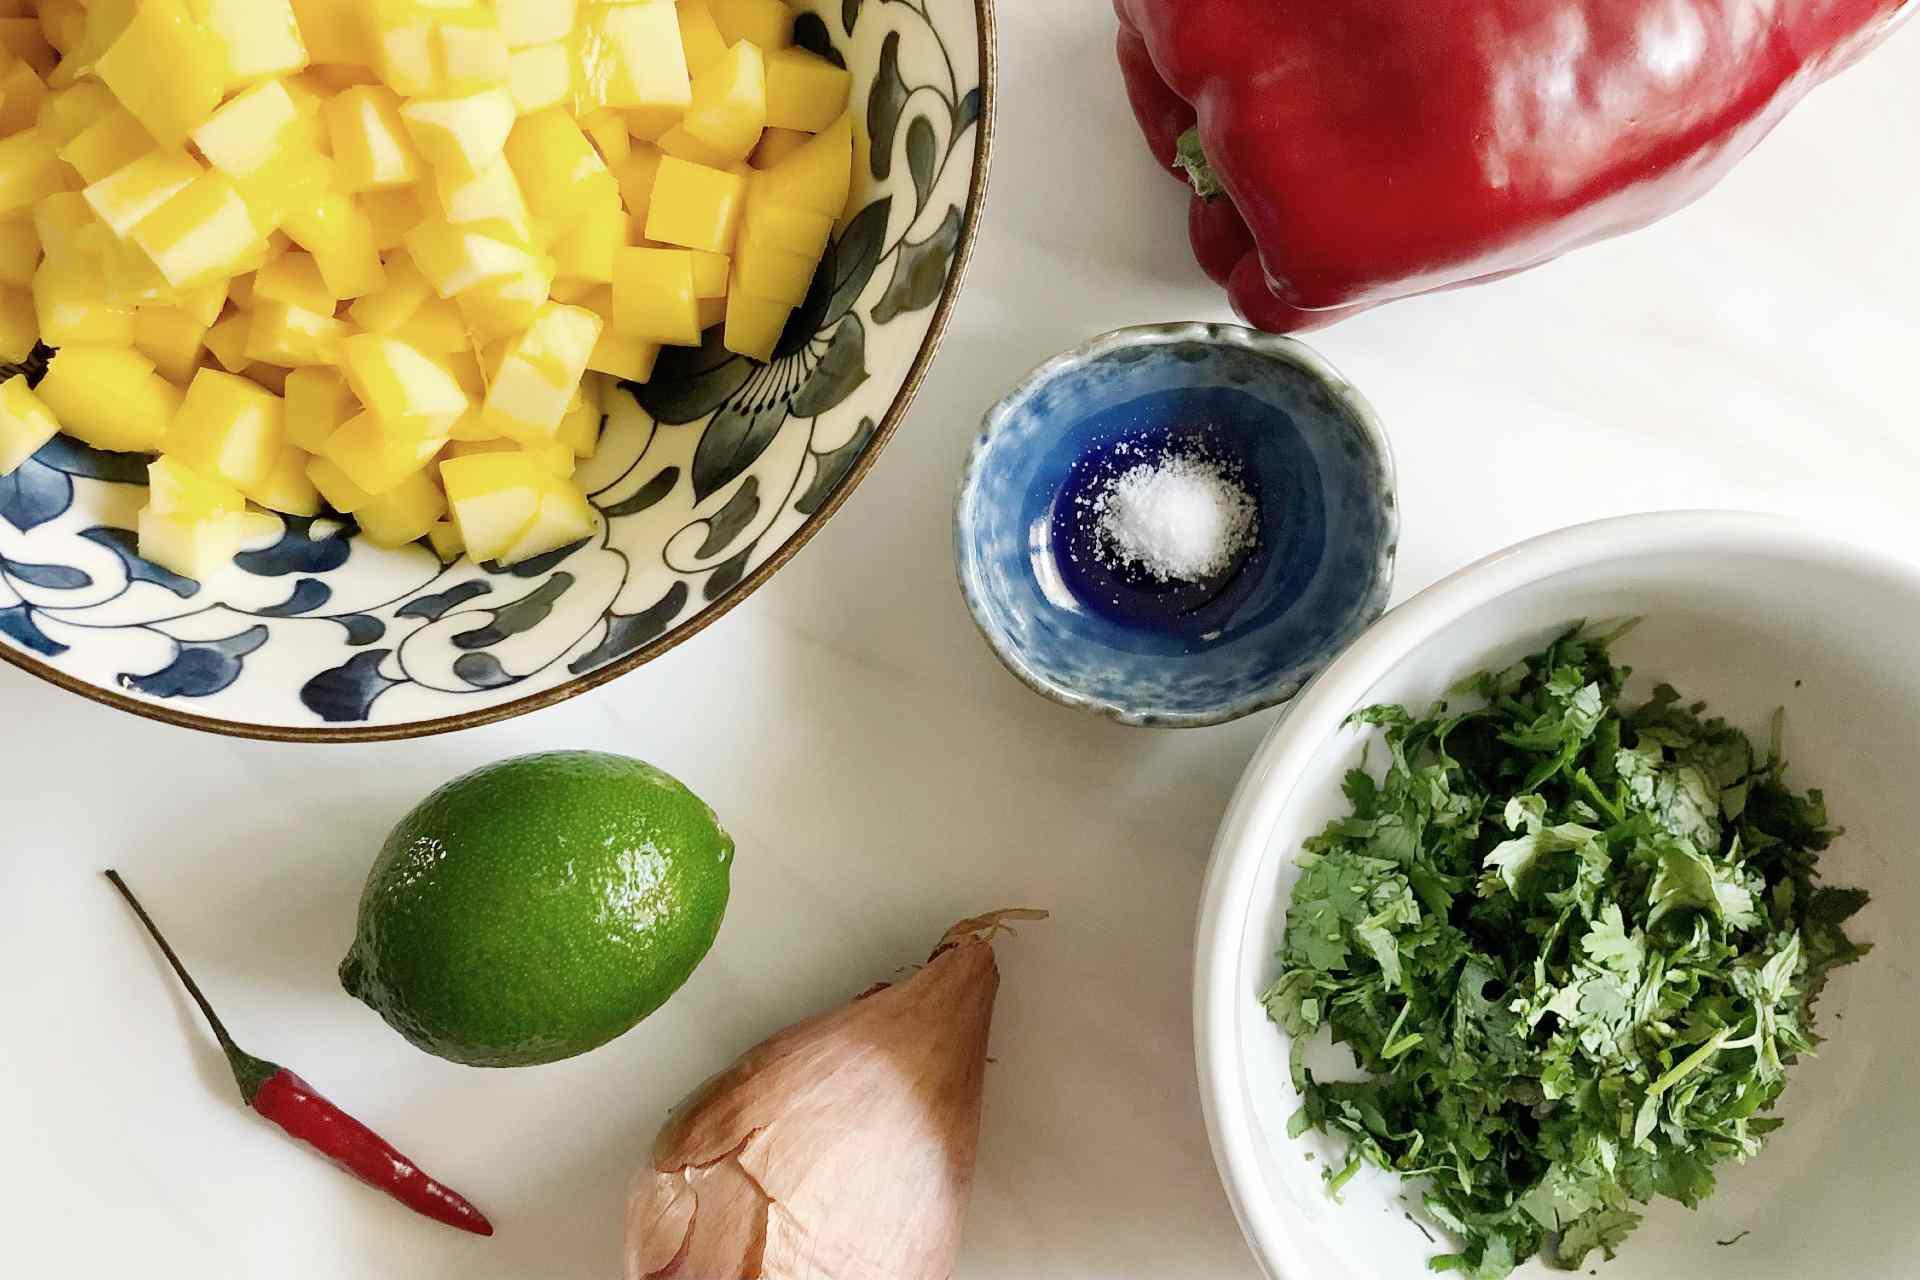 Ingredients for mango salsa to go with turkey lettuce wraps